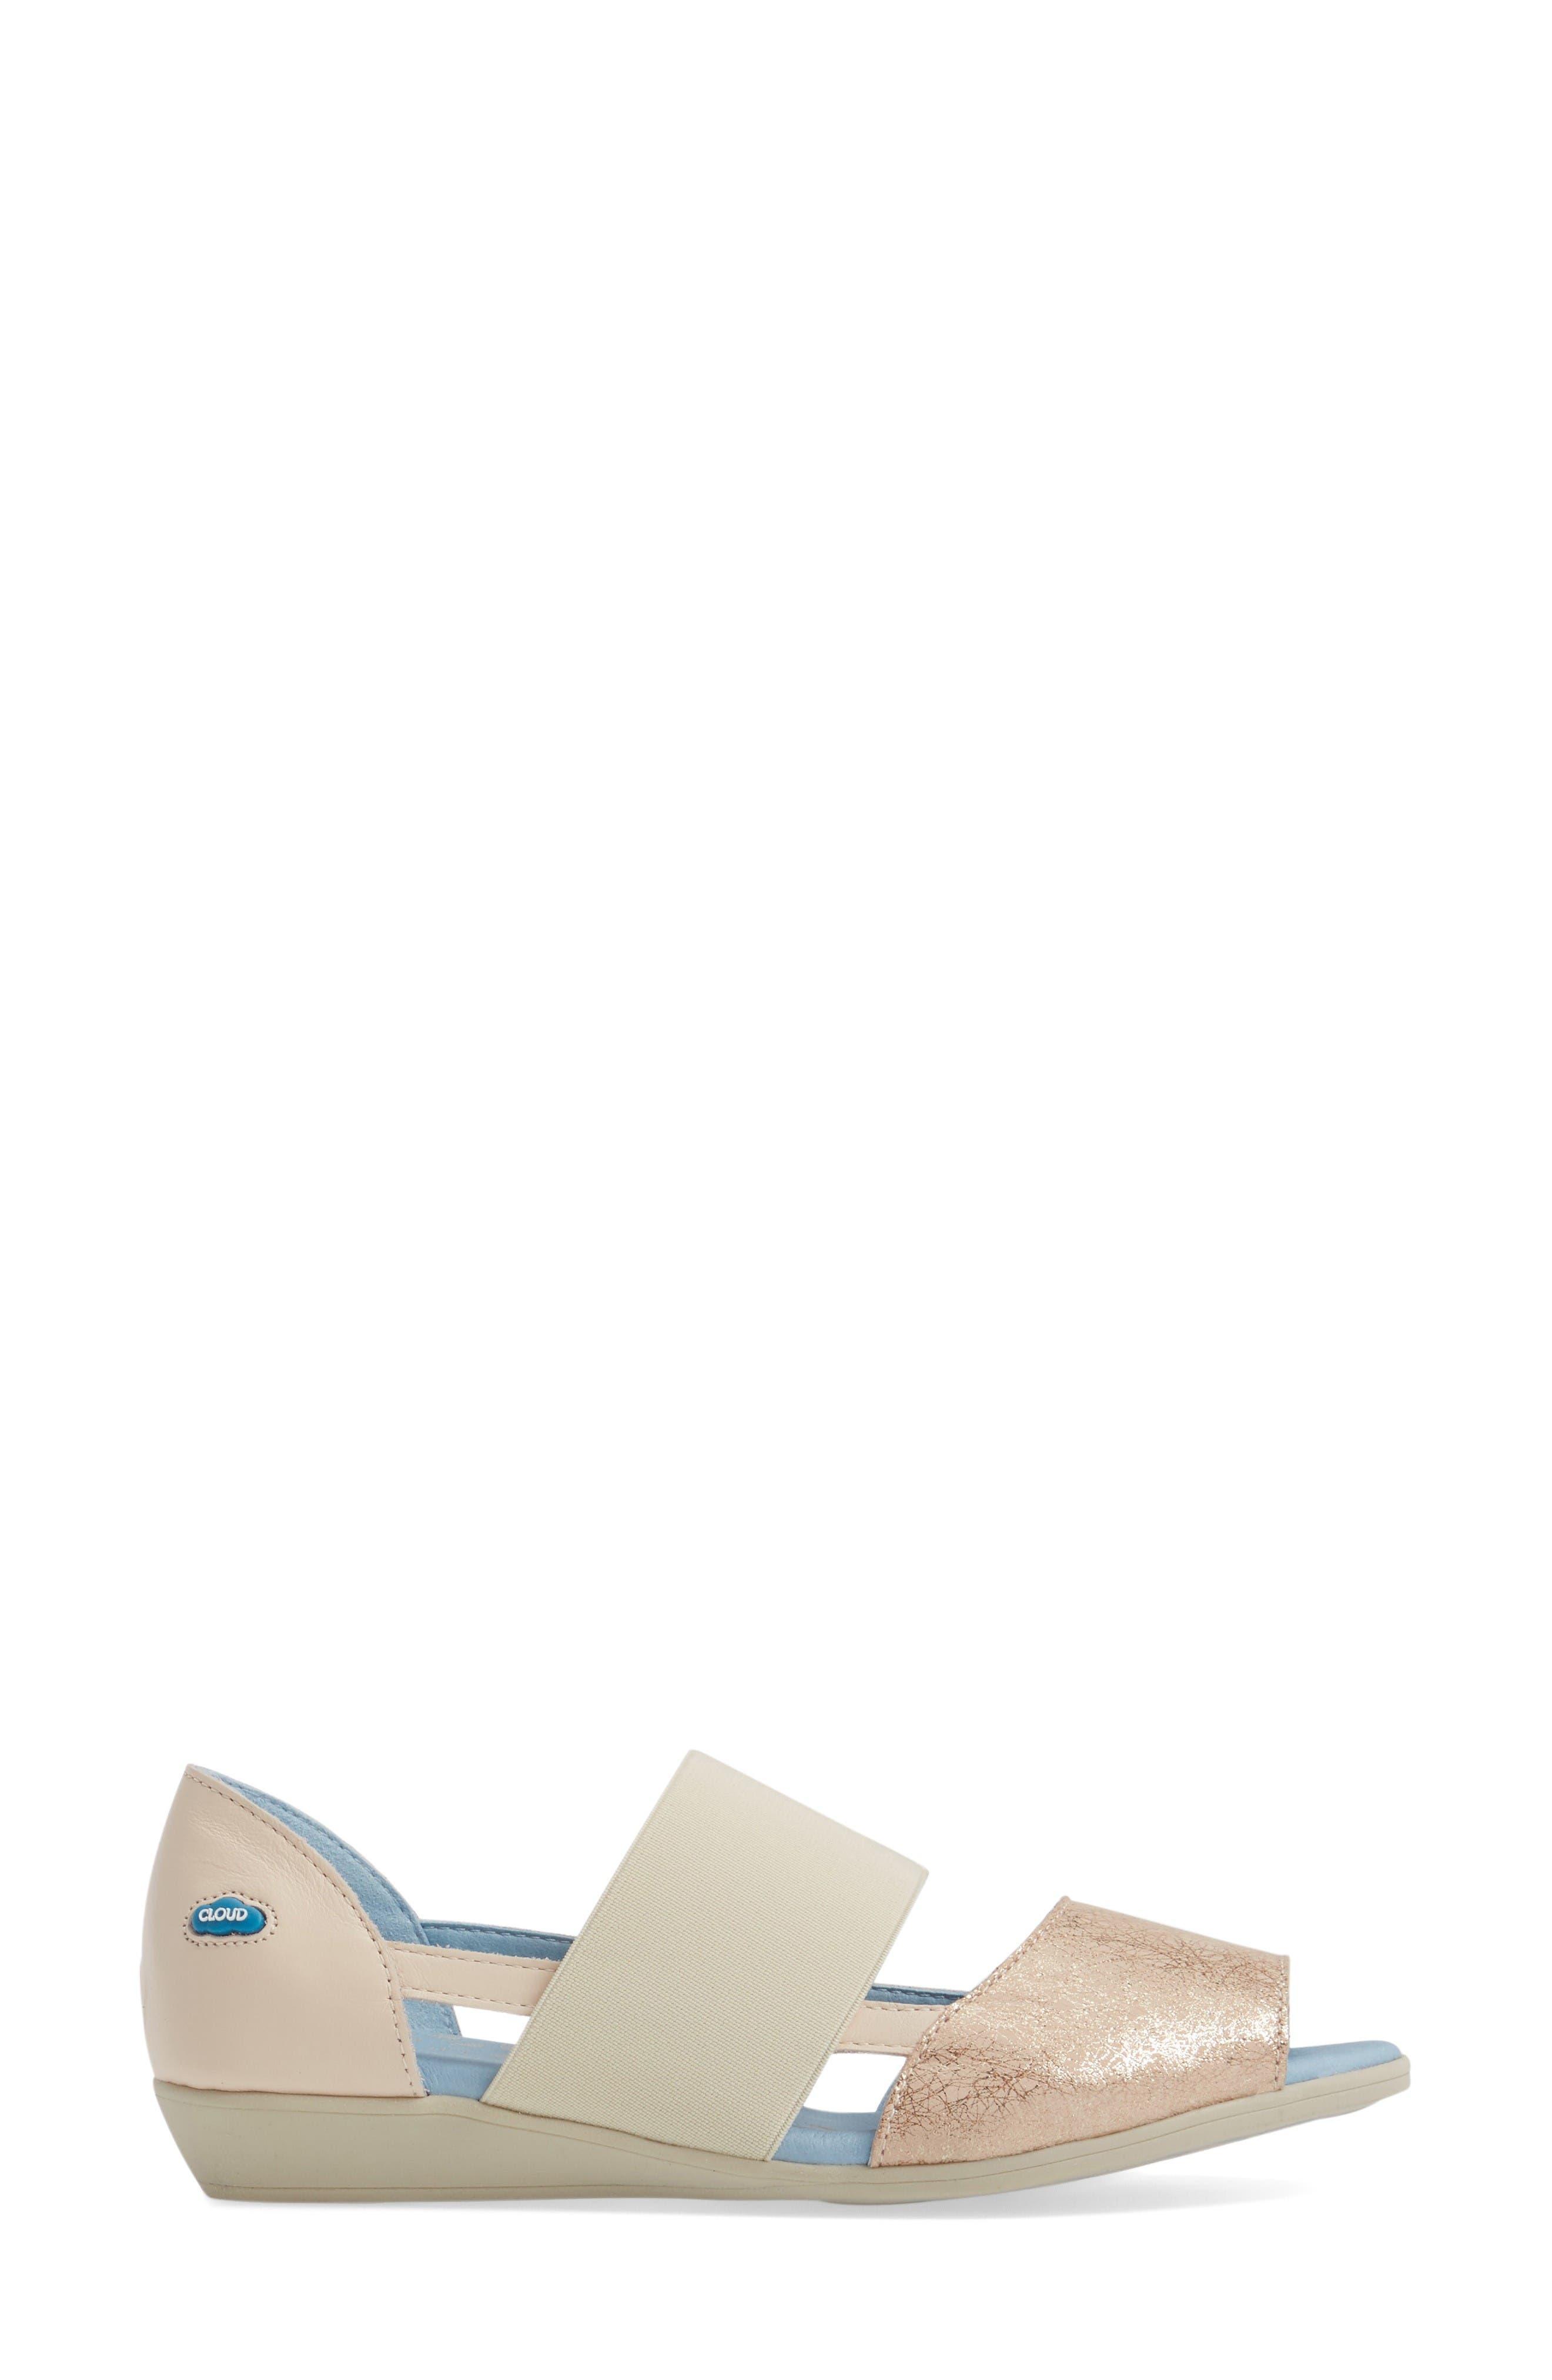 Alternate Image 3  - CLOUD 'Canary' Skimmer Flat (Women)